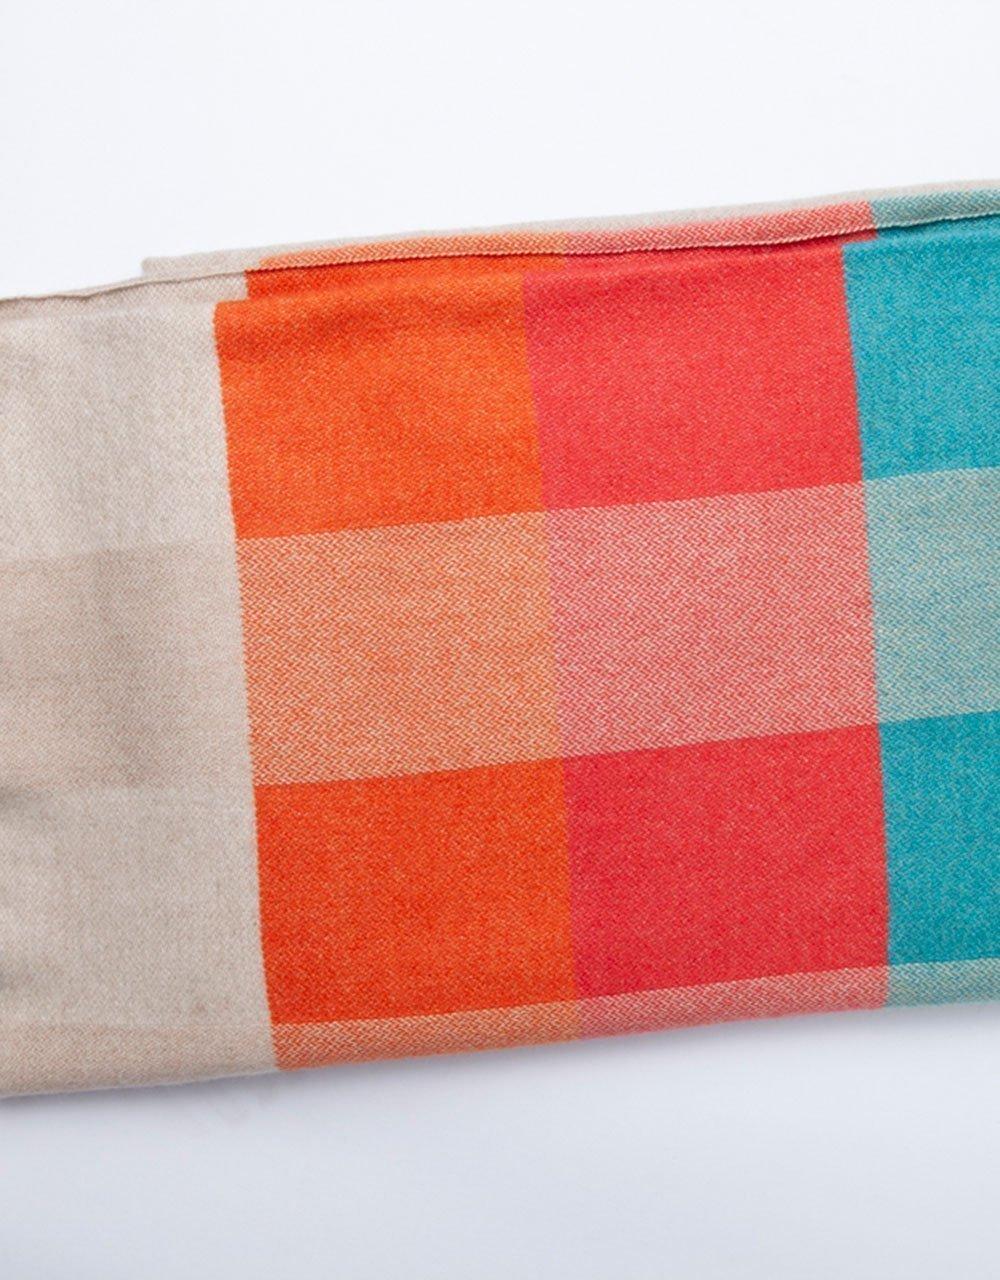 blanket08c